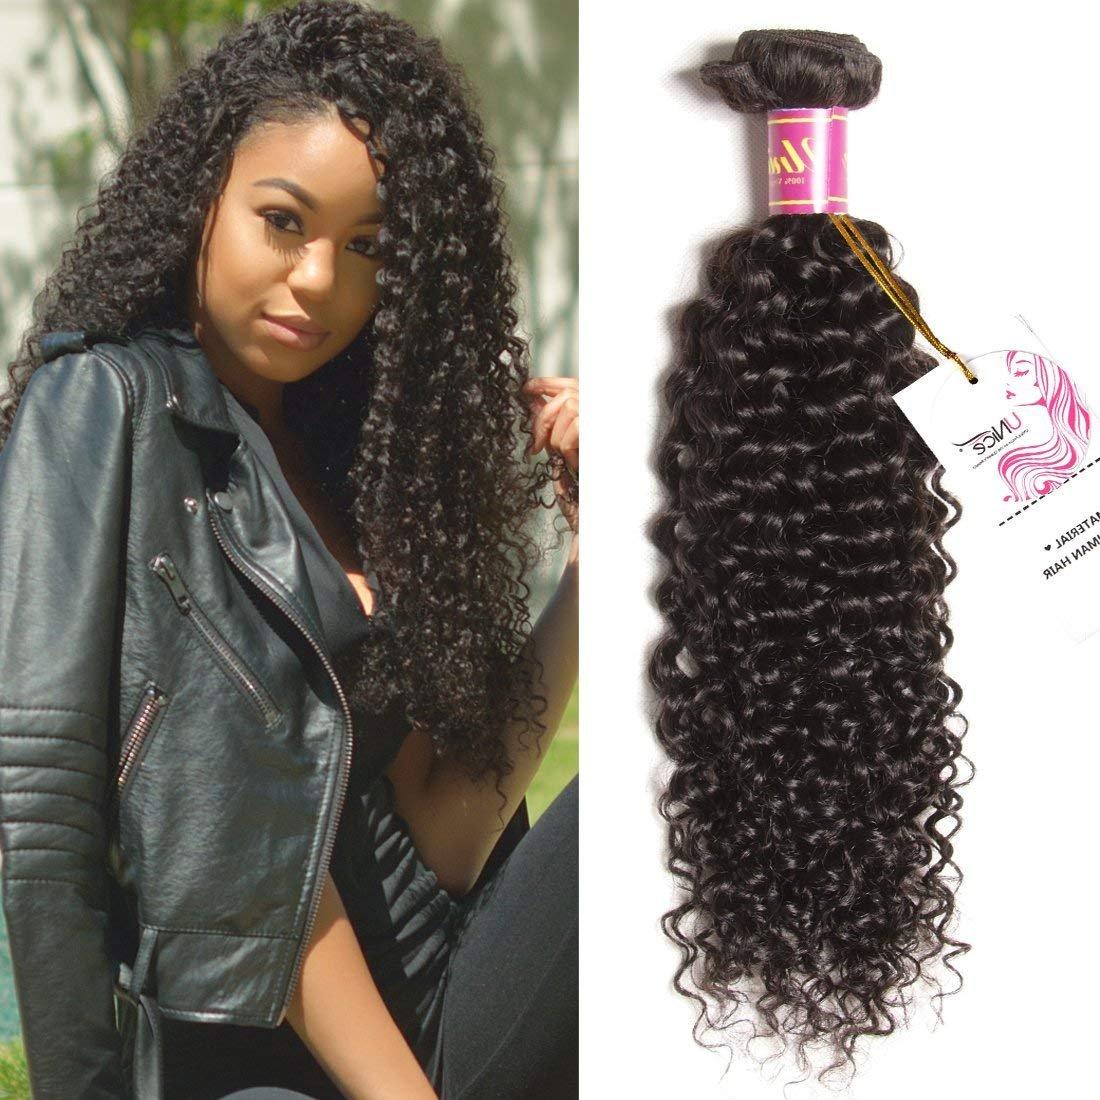 Amazon Unice 8a Brazilian Virgin Hair 1 Bundle Of Curly Hair